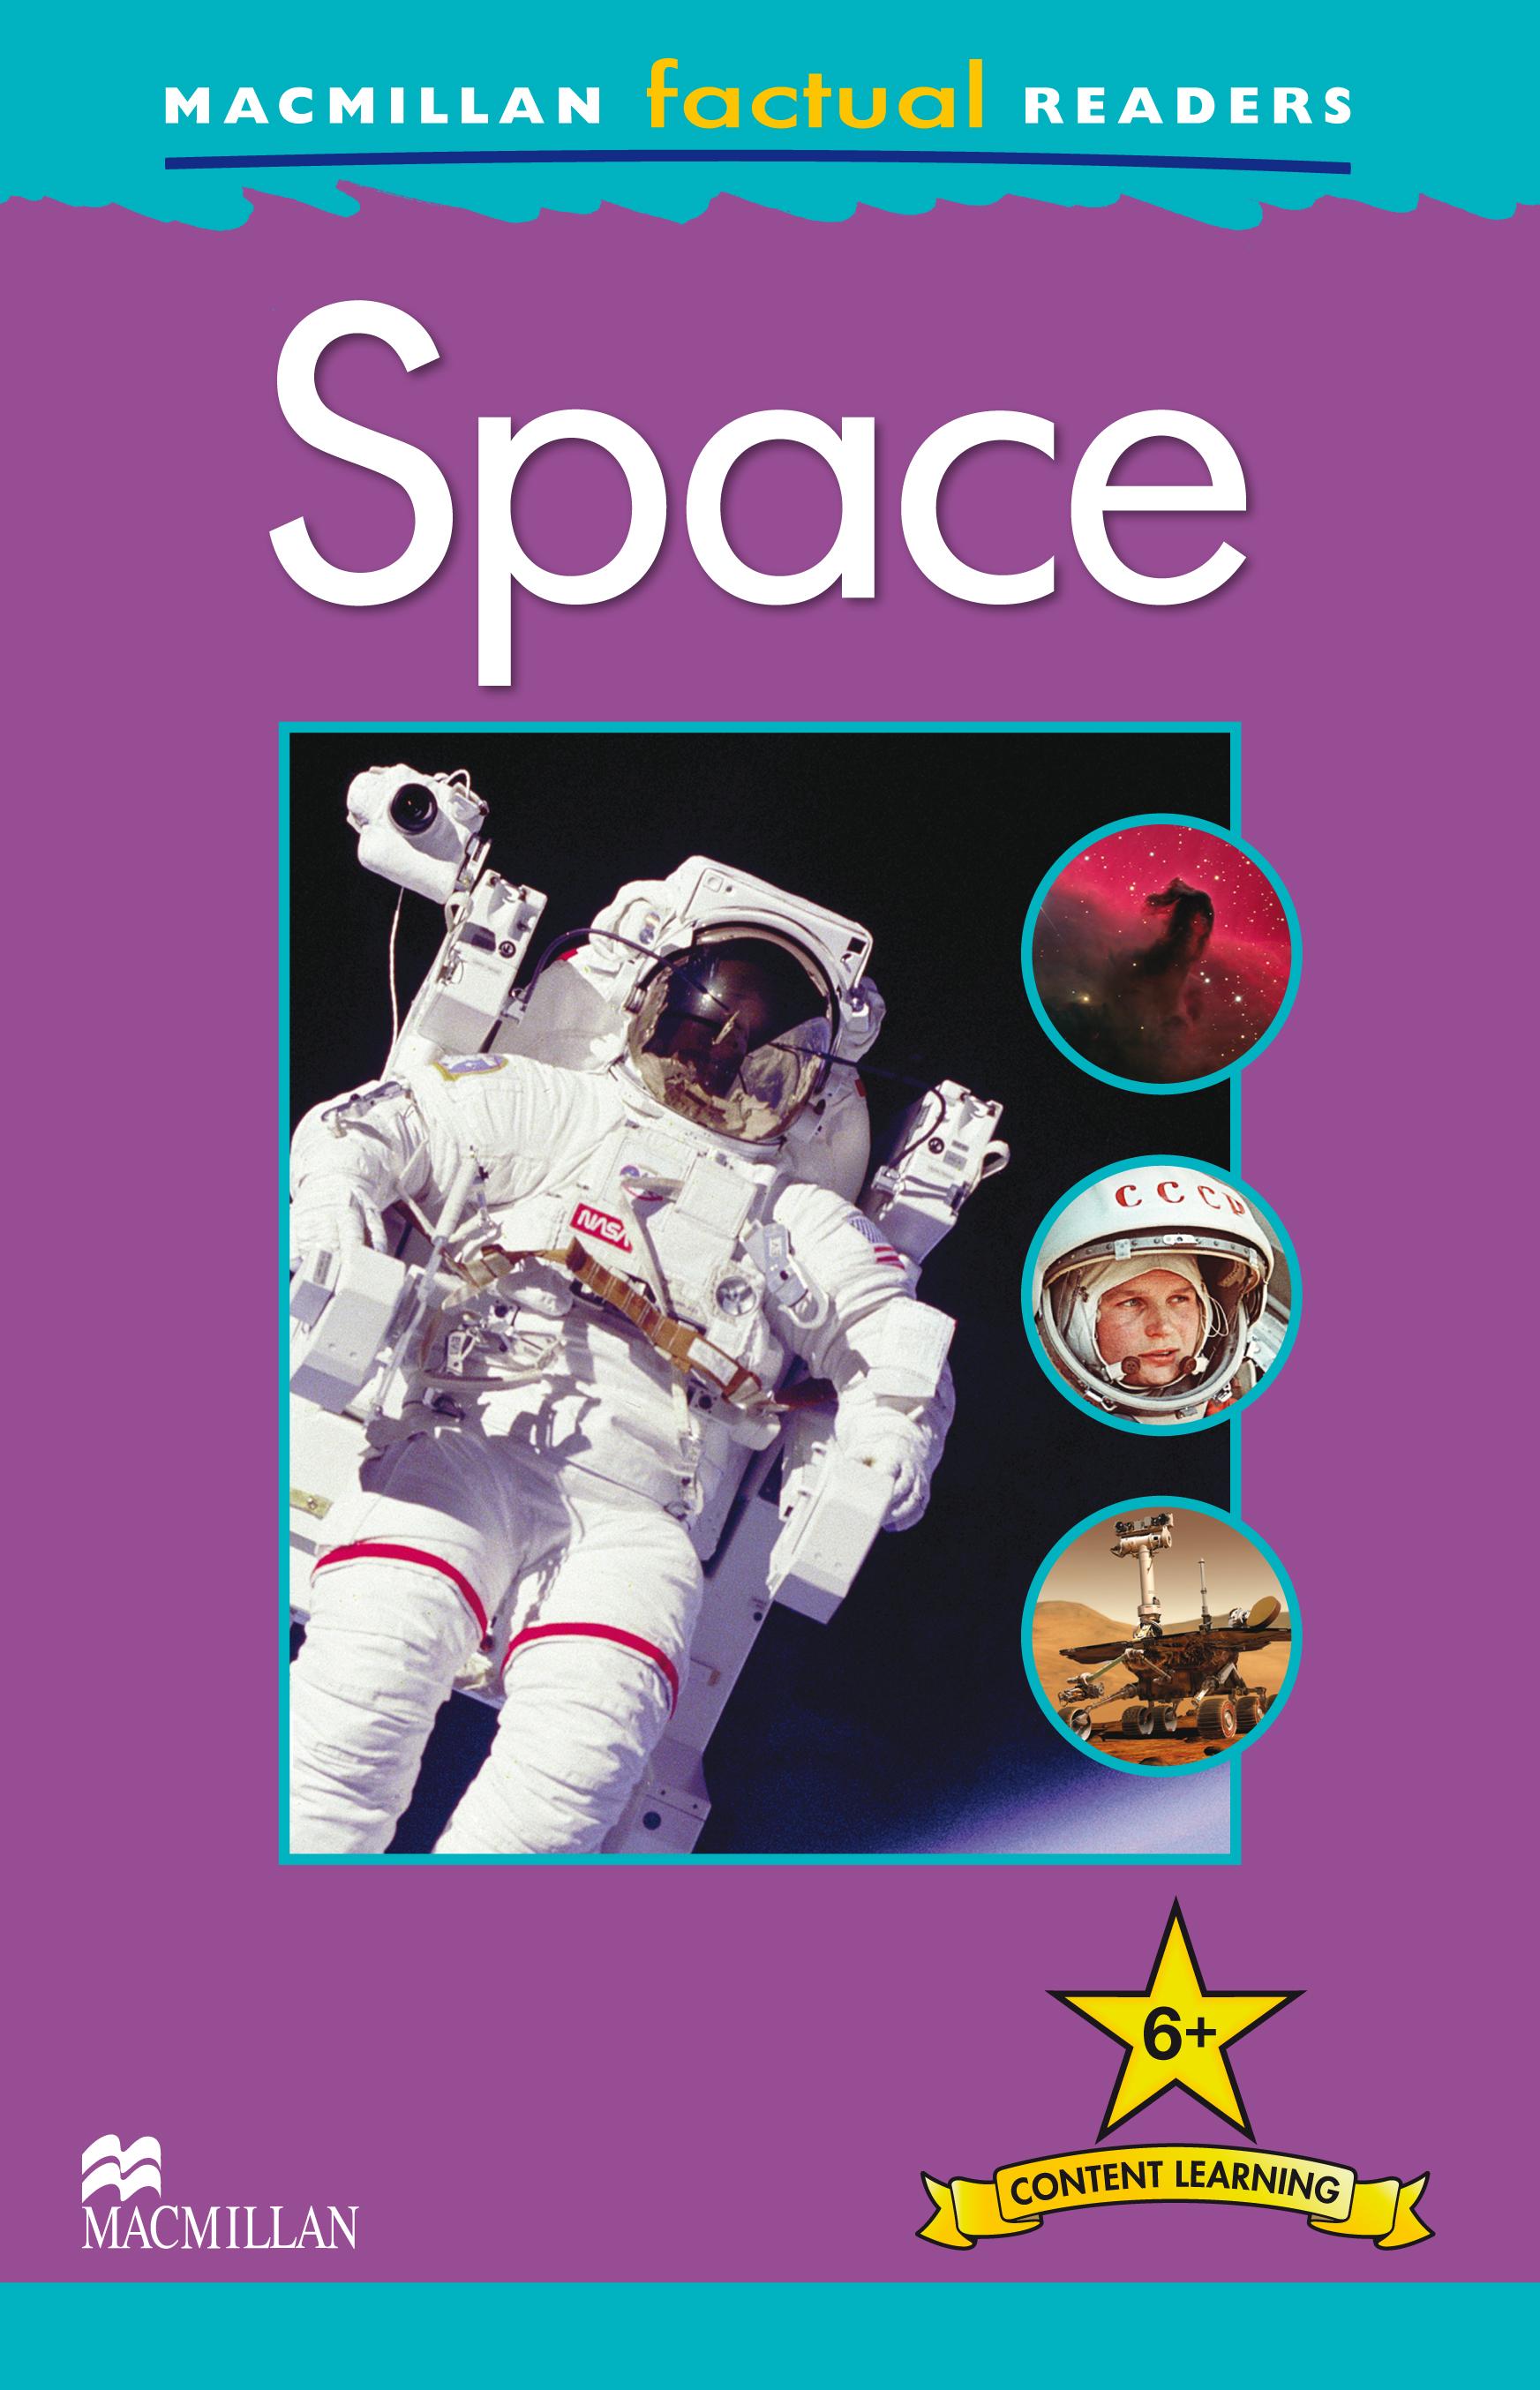 Macmillan Factual Readers: Space